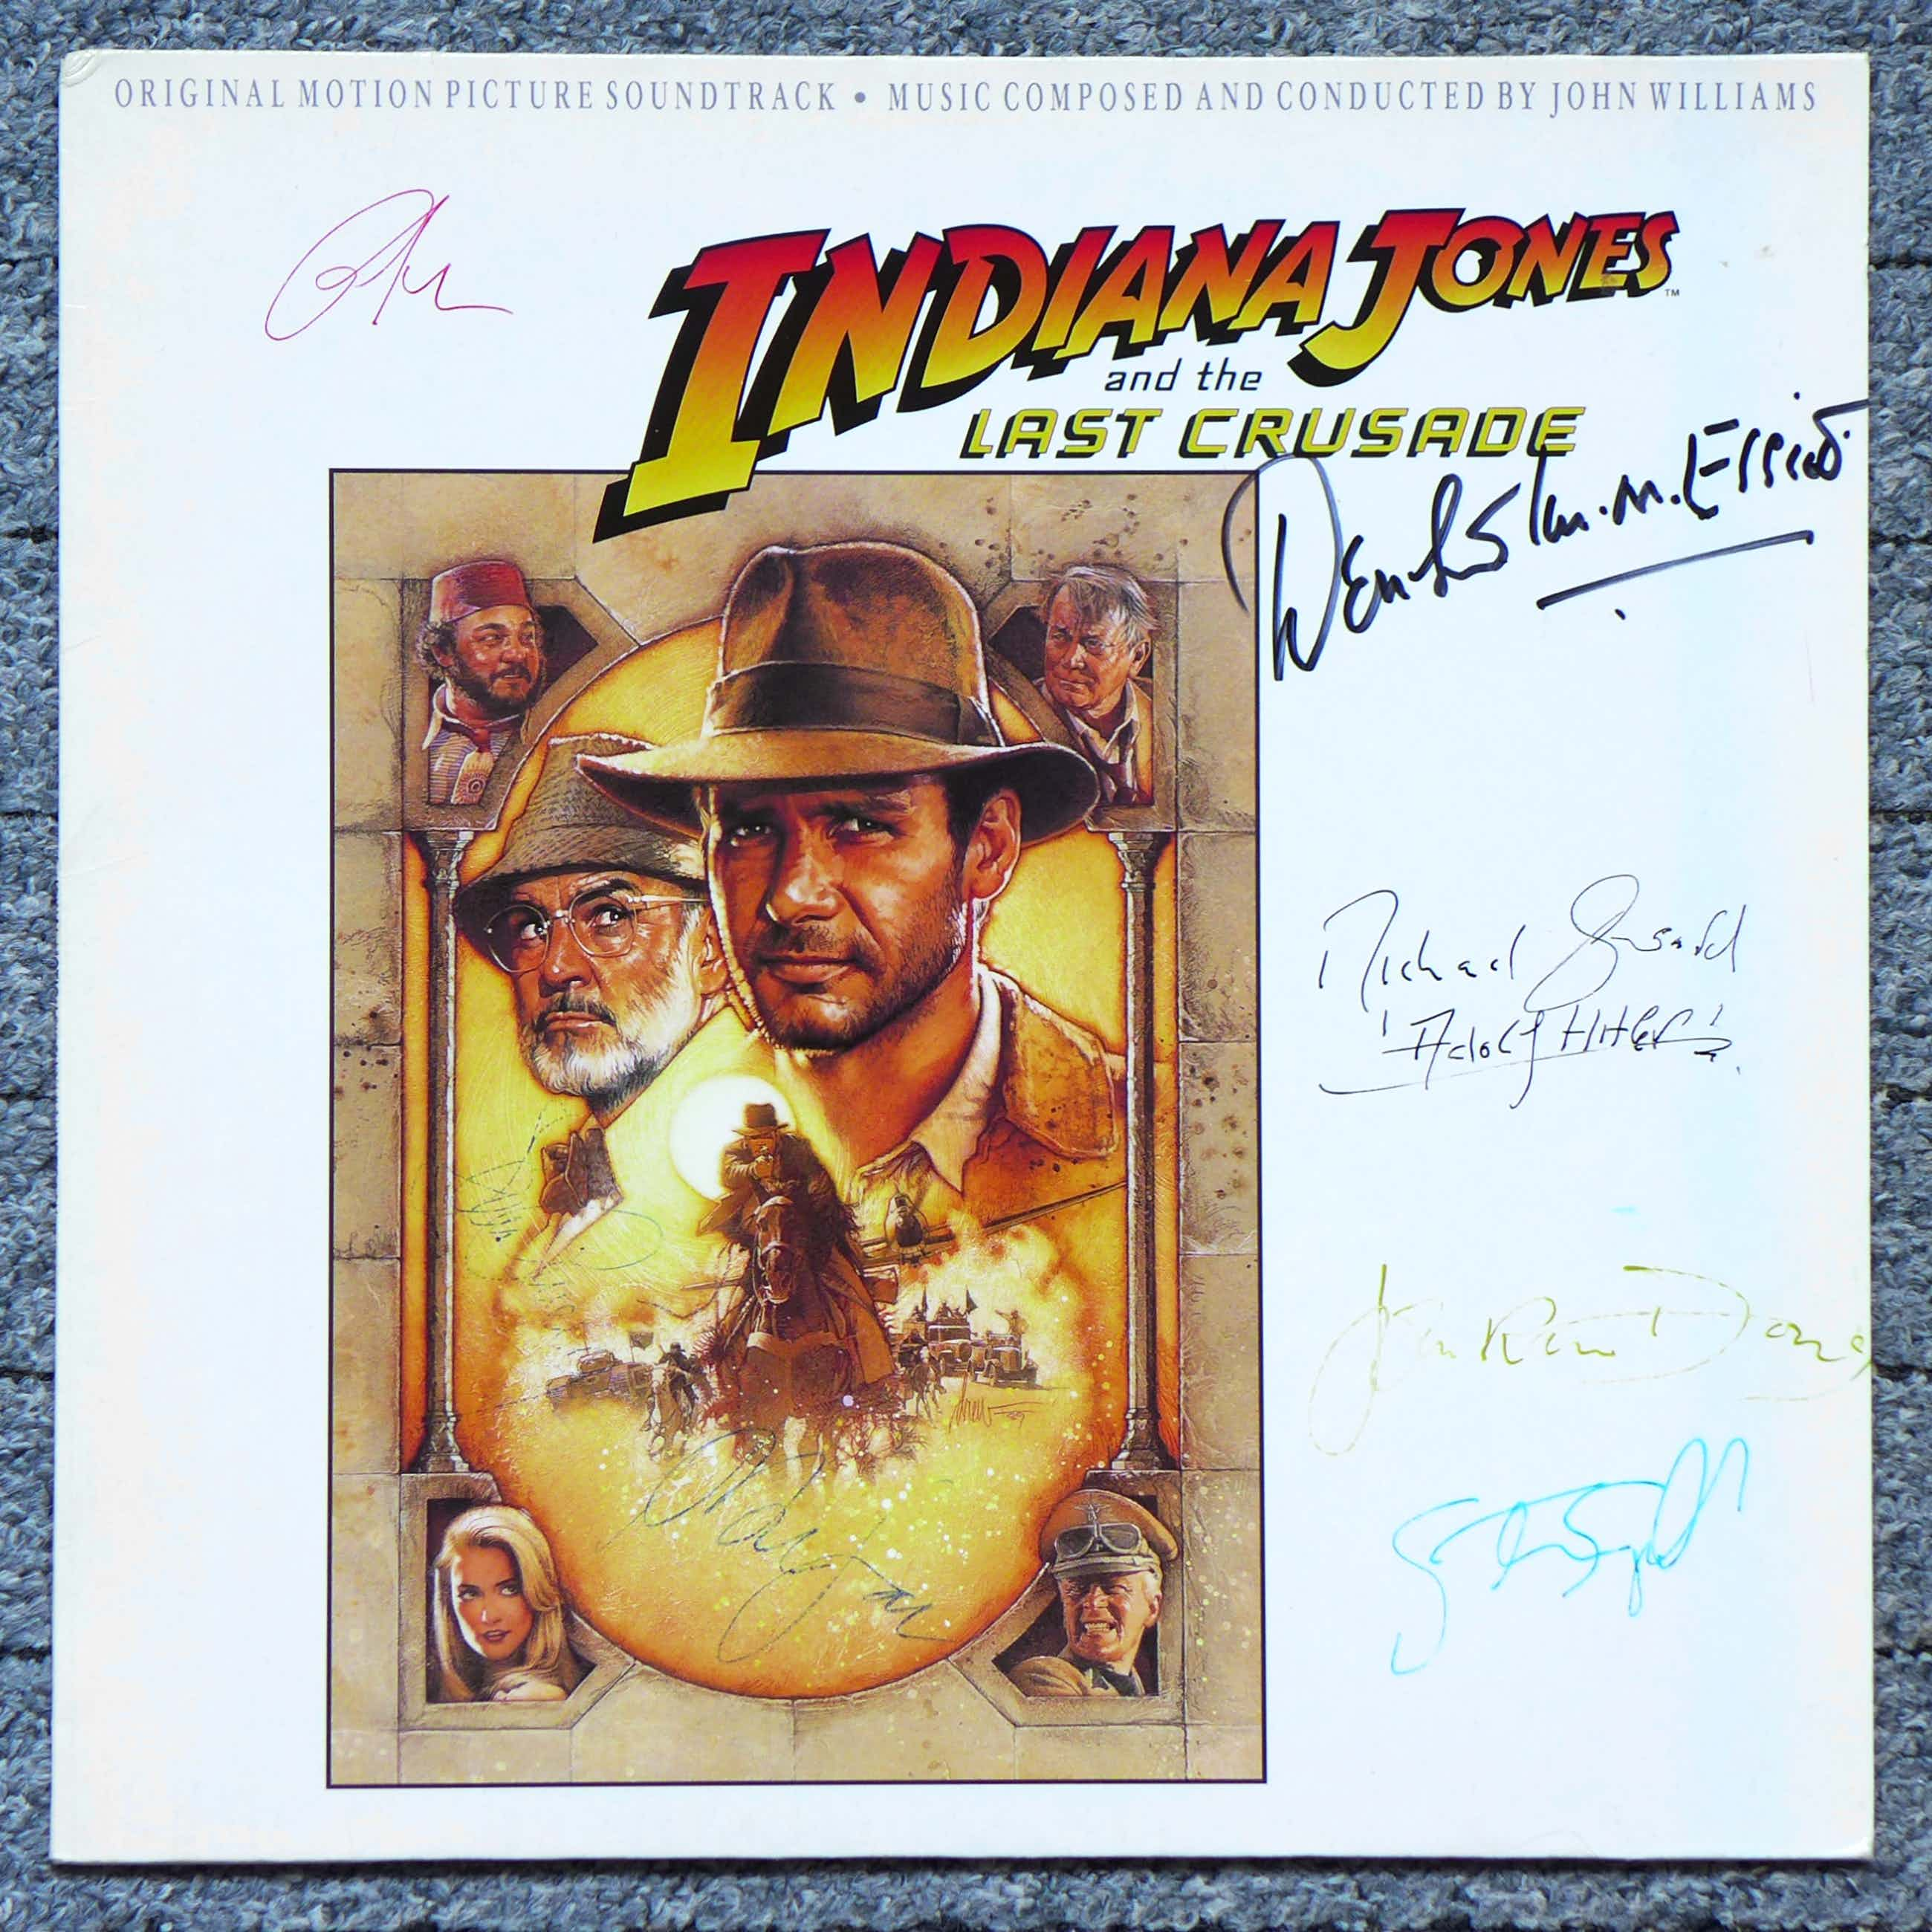 John Williams - Indiana Jones Last Crusade LP signiert Connery Ford Spielberg Lucas +3 kopen? Bied vanaf 99!